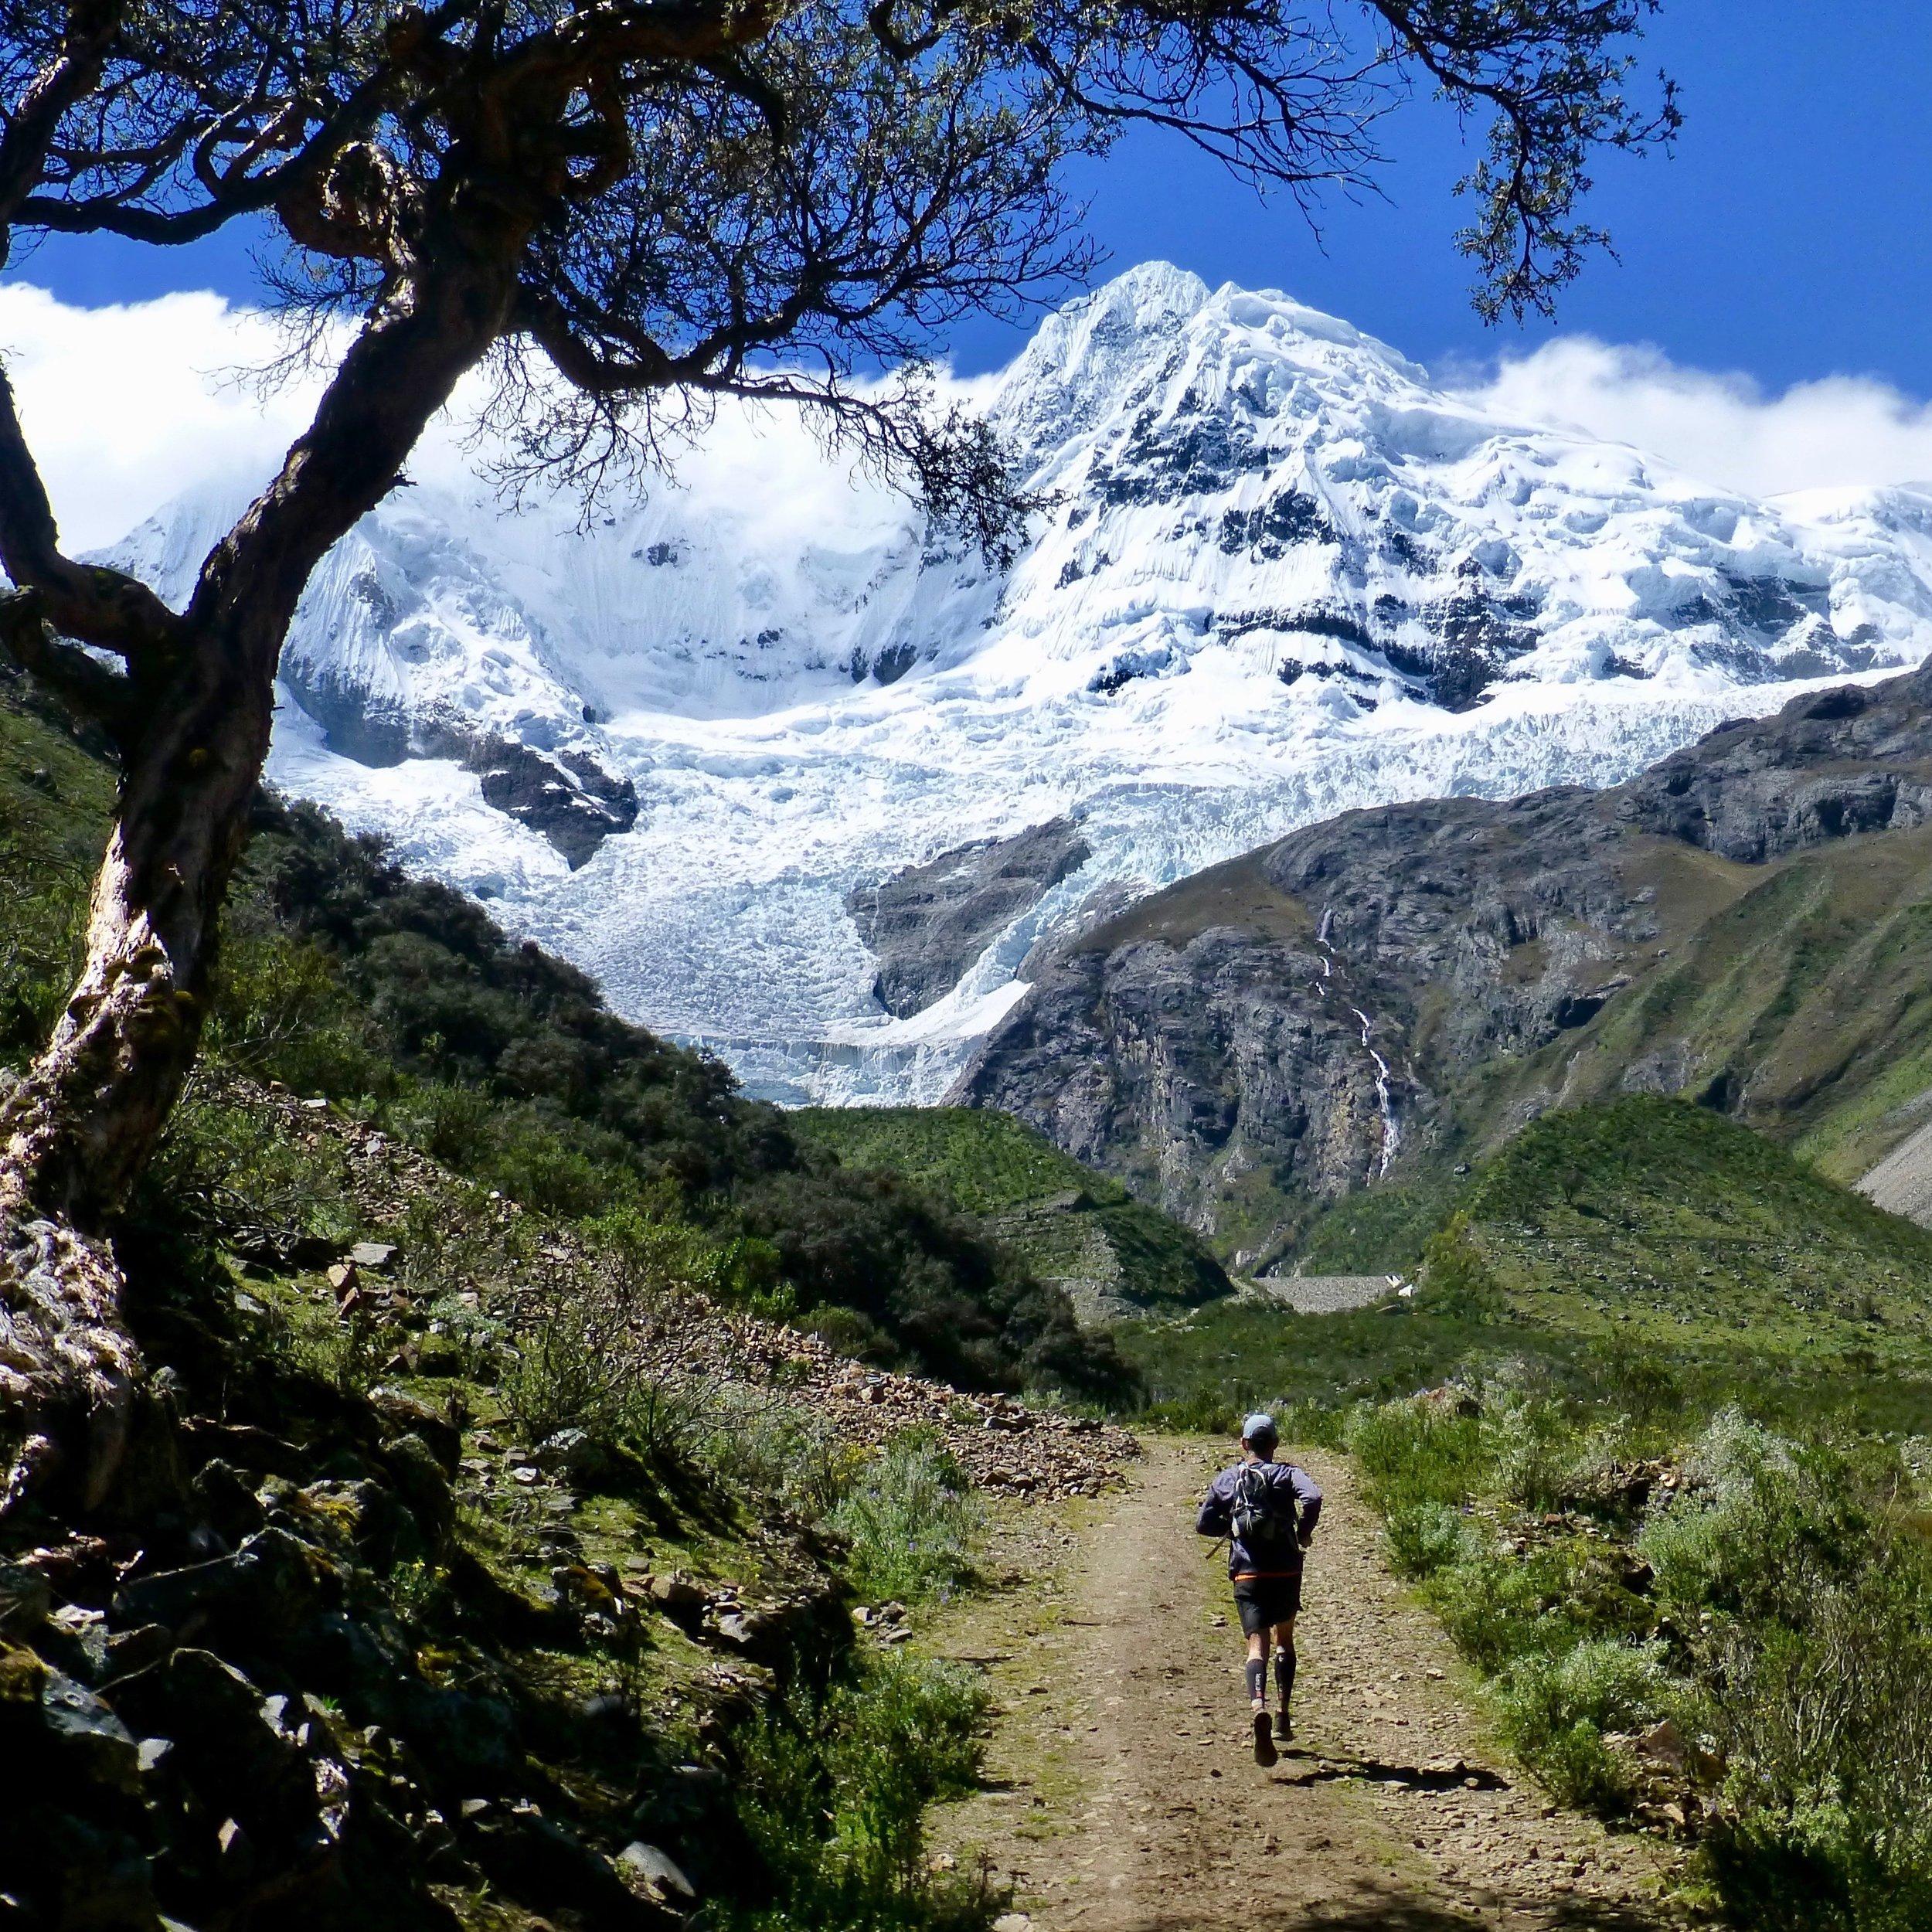 CUSTOM RUNNING ADVENTURES - Custom day and multi-day trail running adventures in Peru